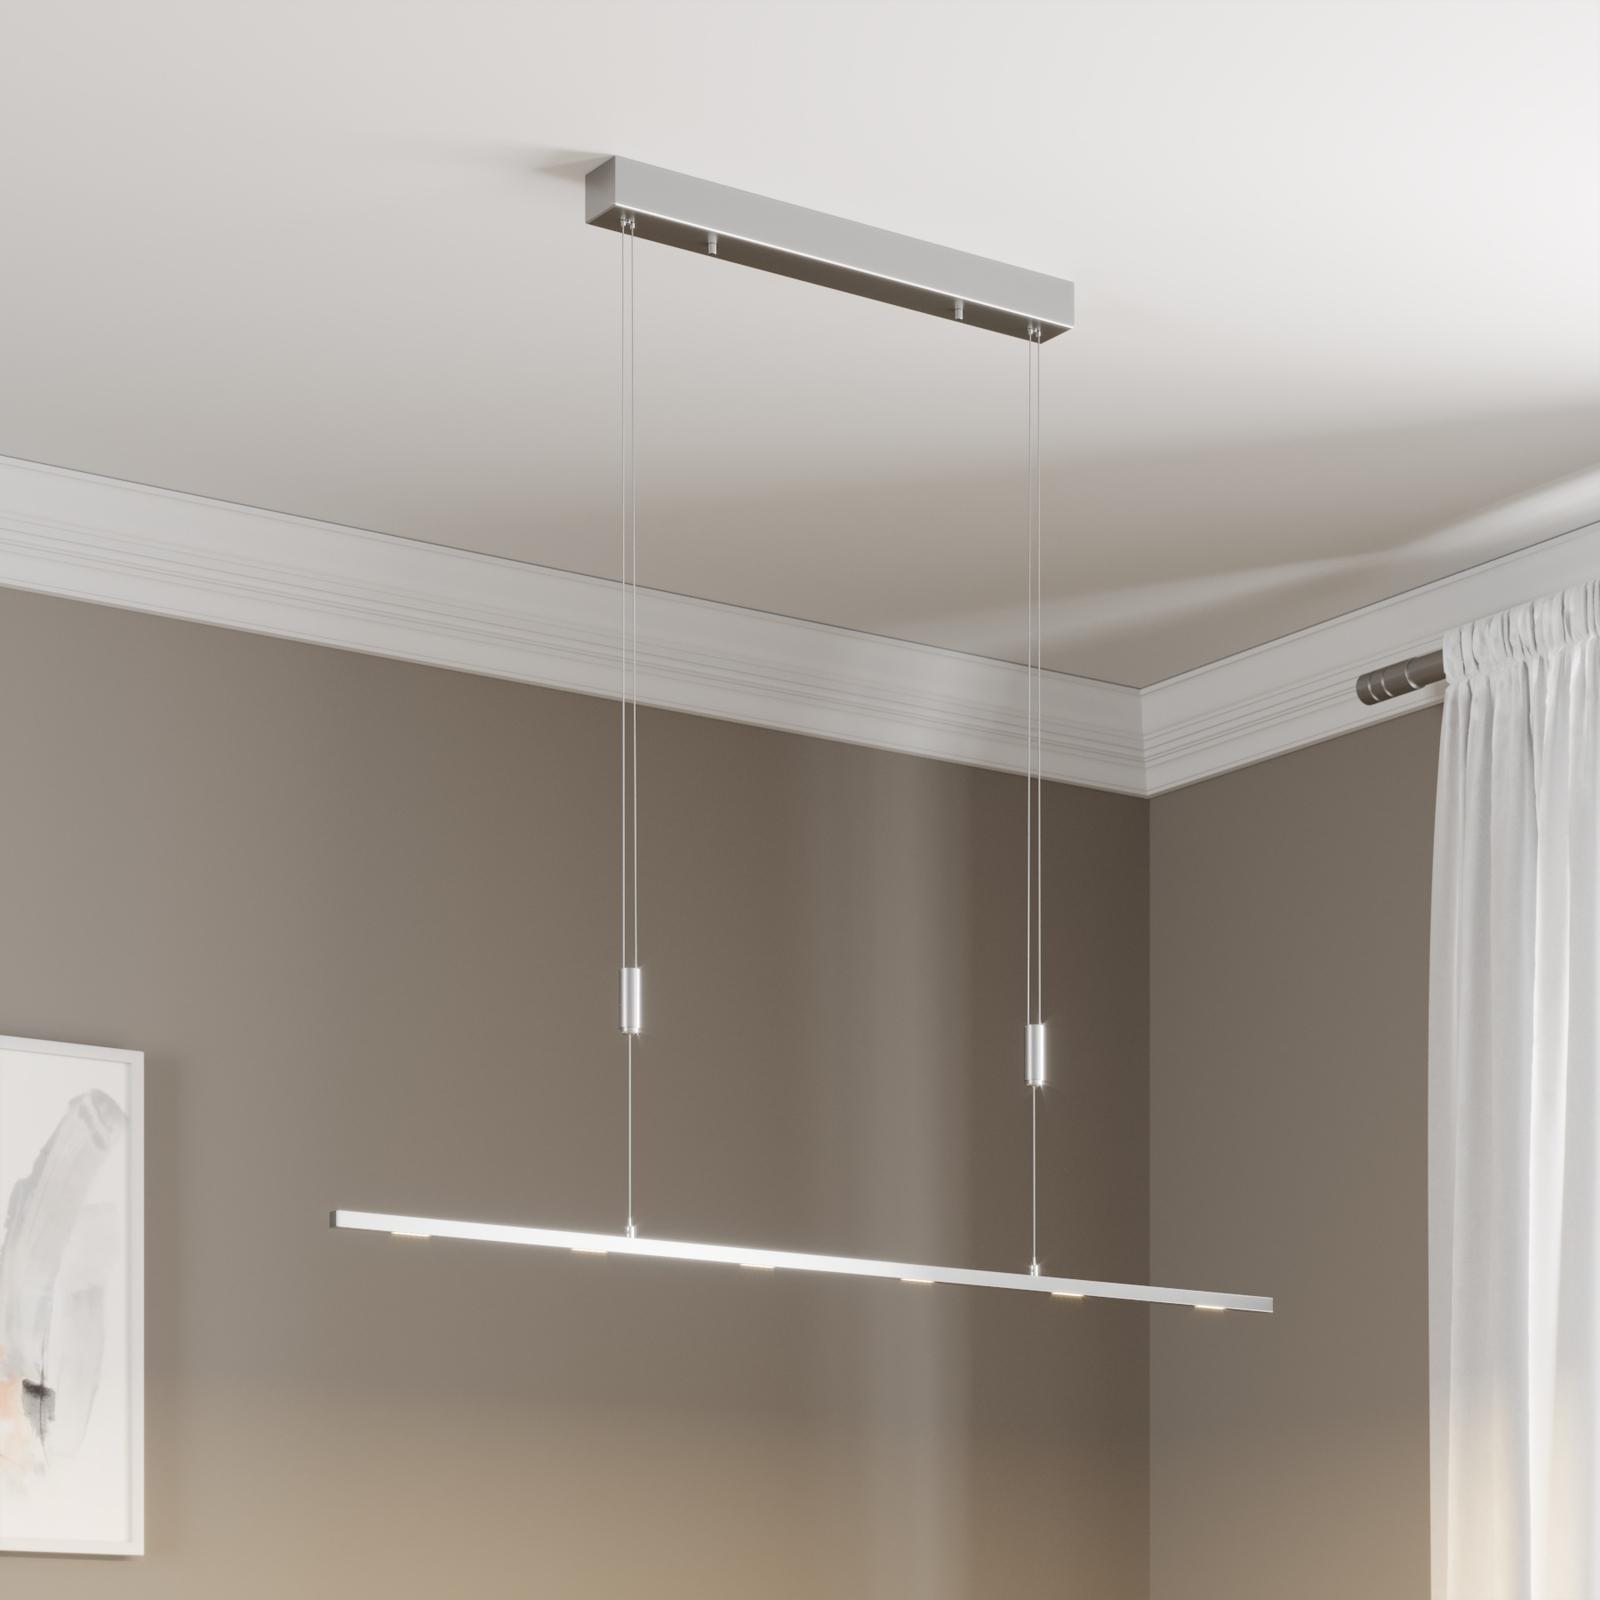 LED hanglamp Arnik, dimbaar via schakelaar